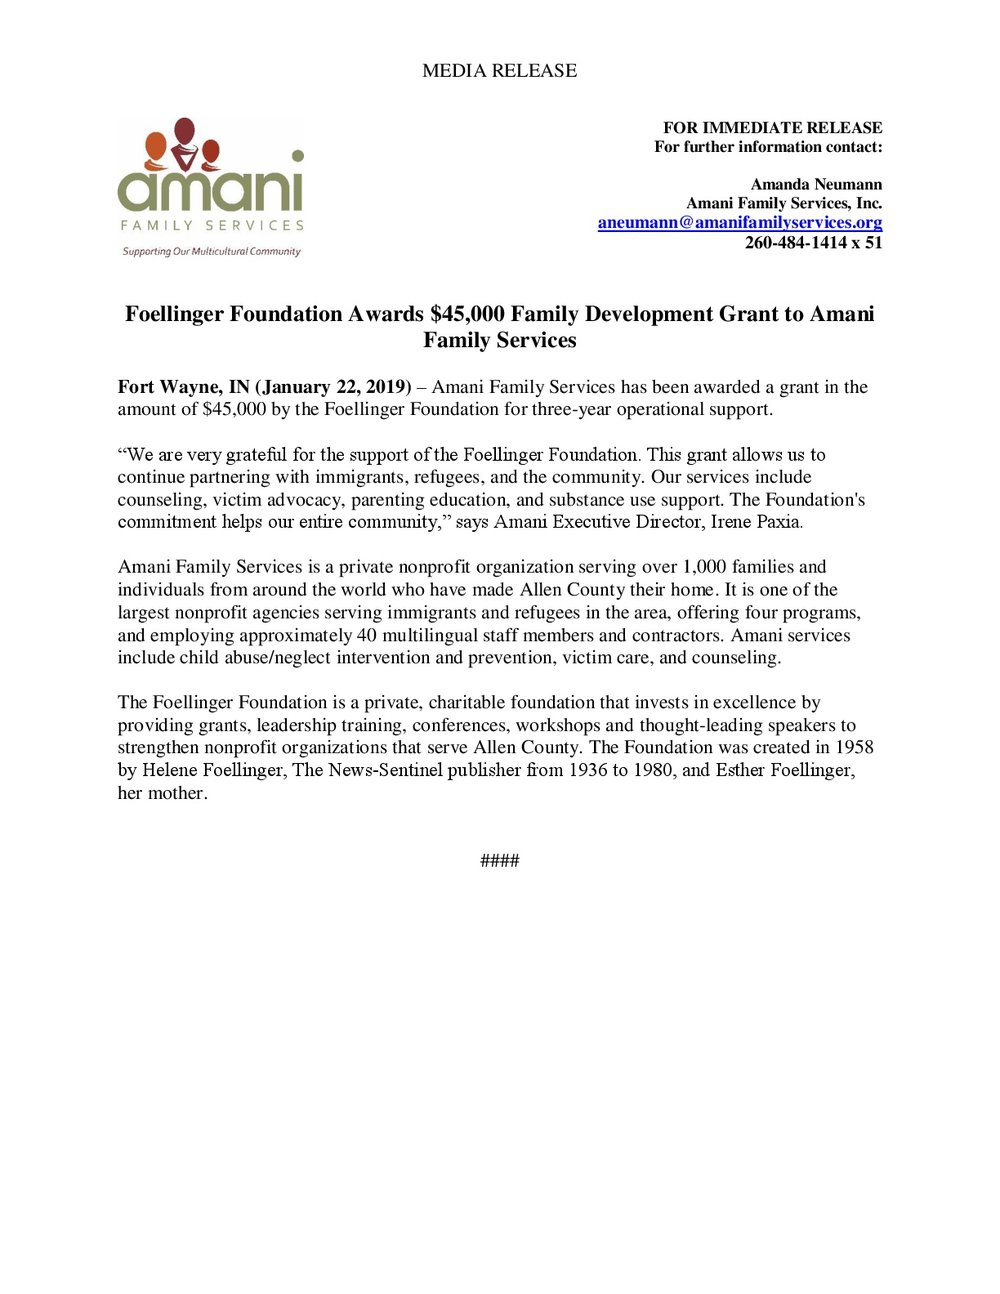 Foellinger 2019 Family Development Press Release - Amani Family Services-001.jpg